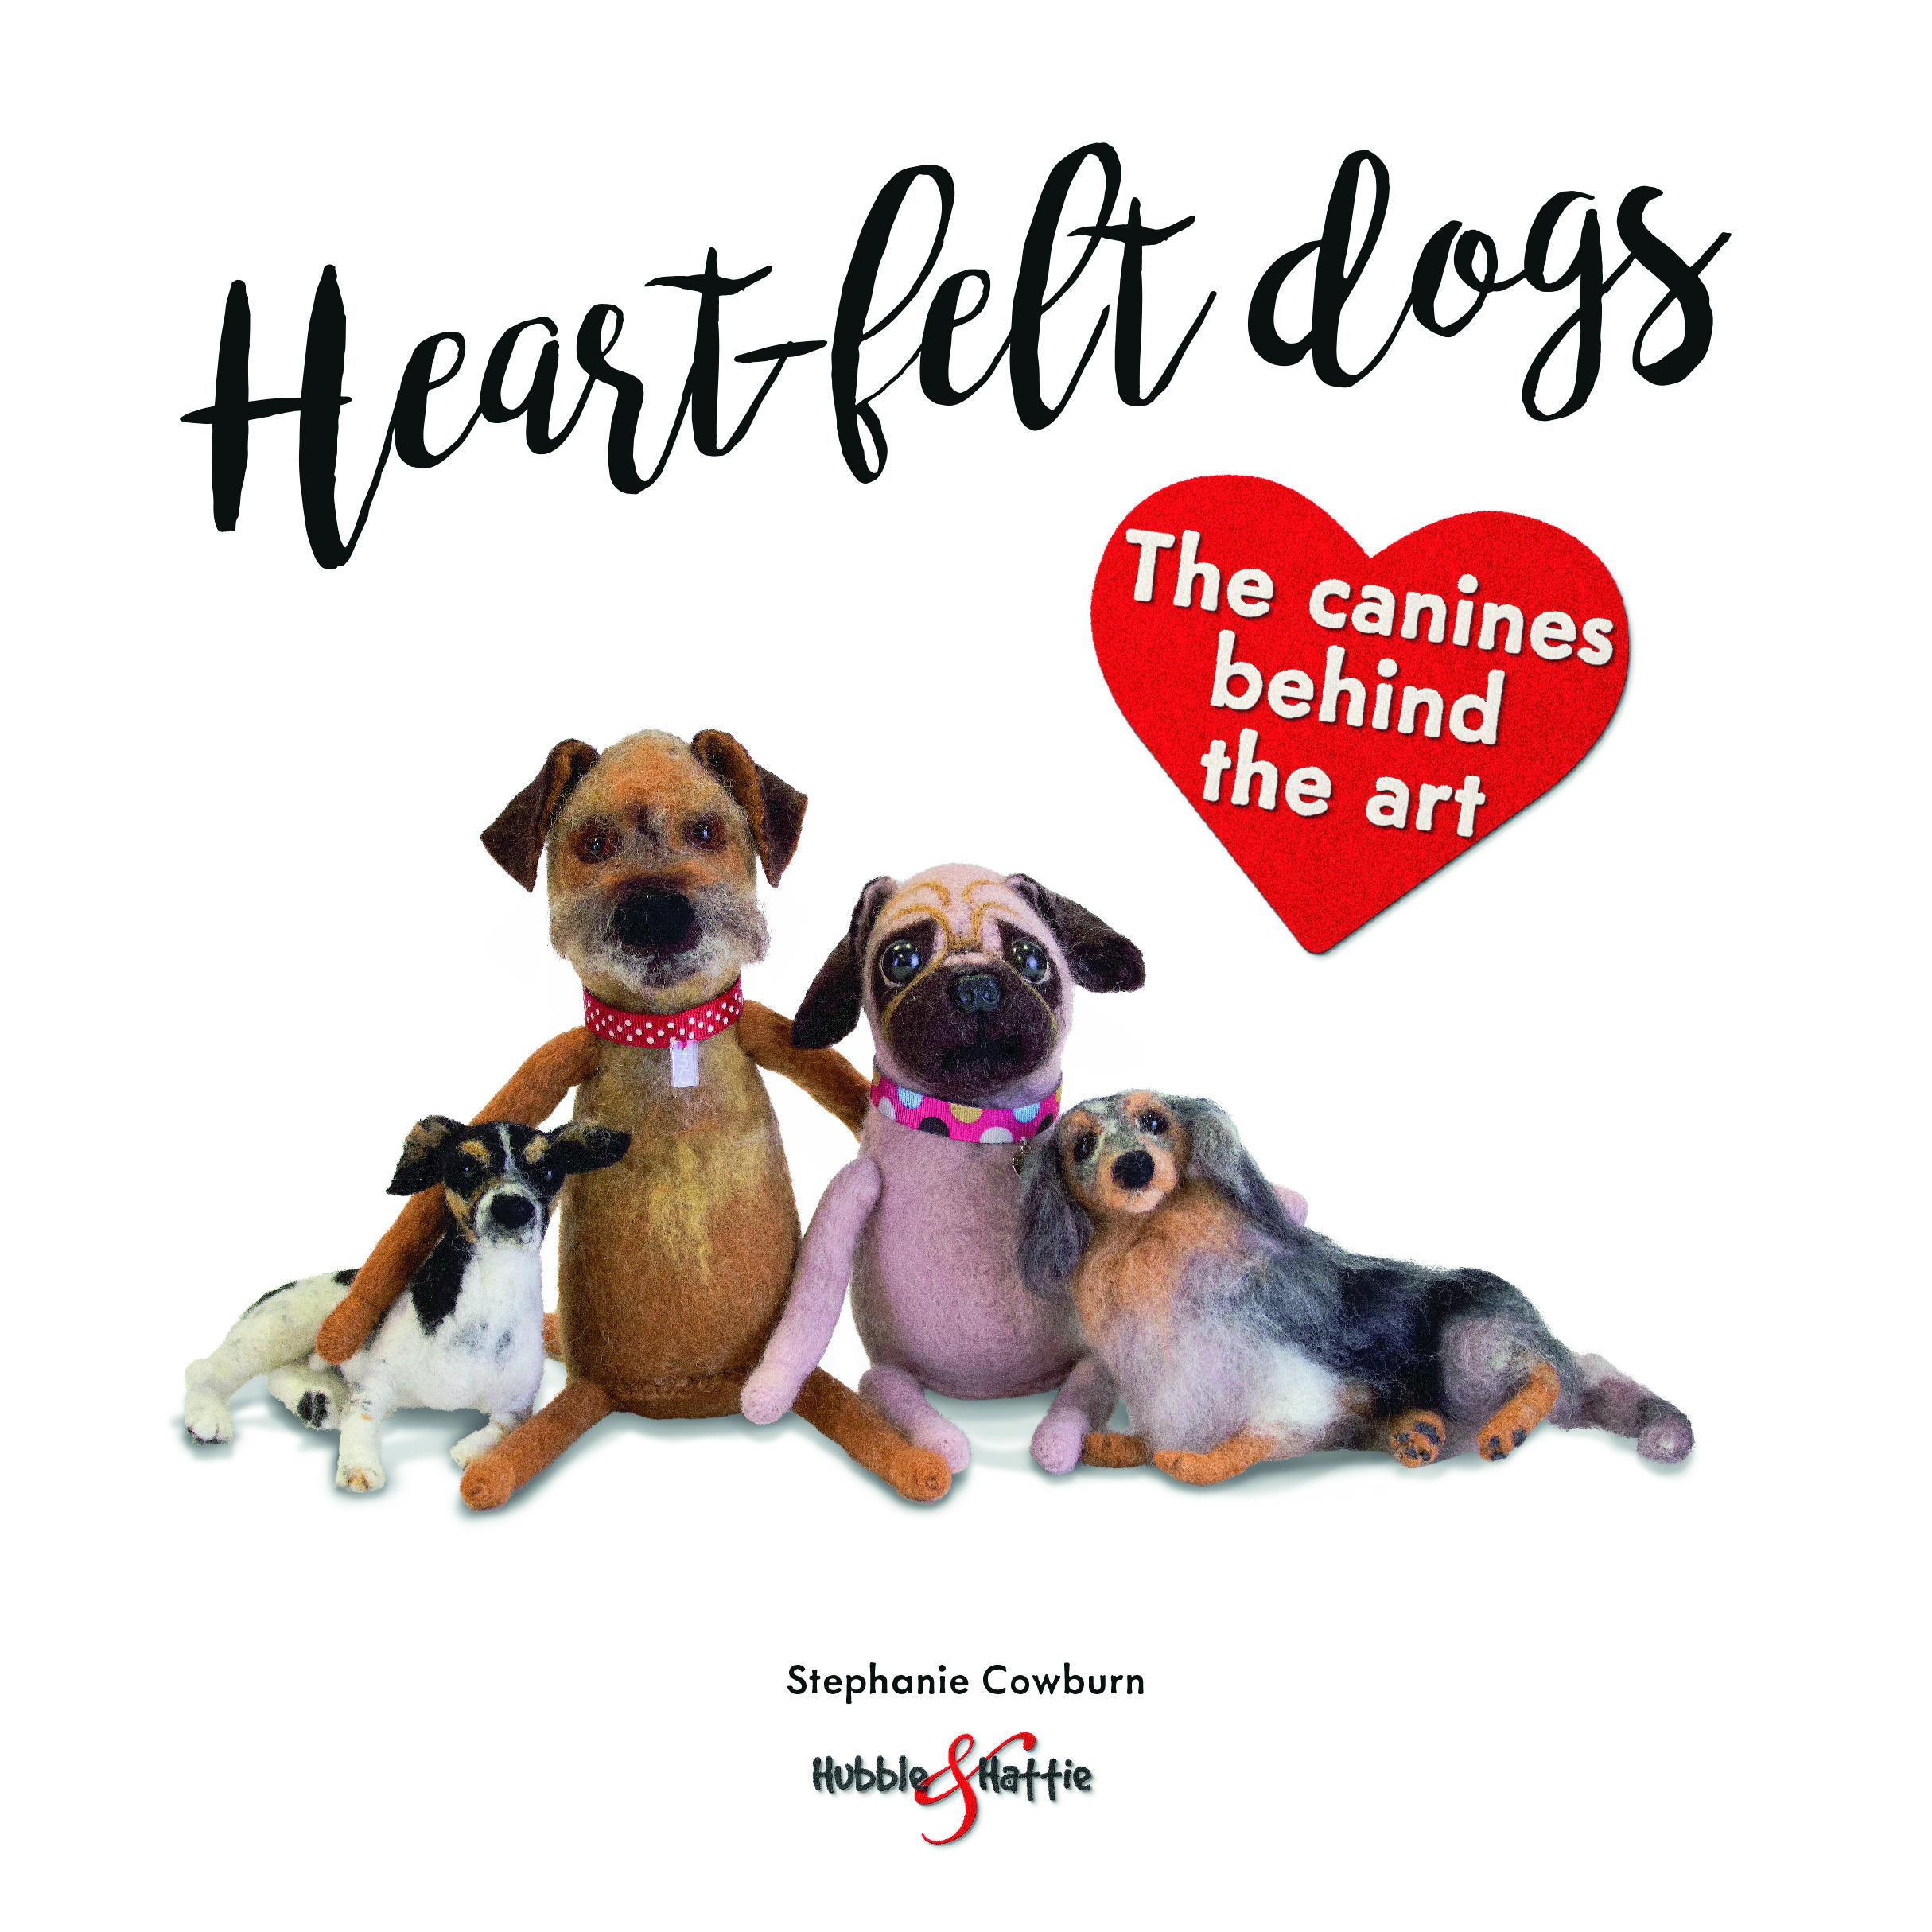 Heart-felt dogs –The canines behind the art